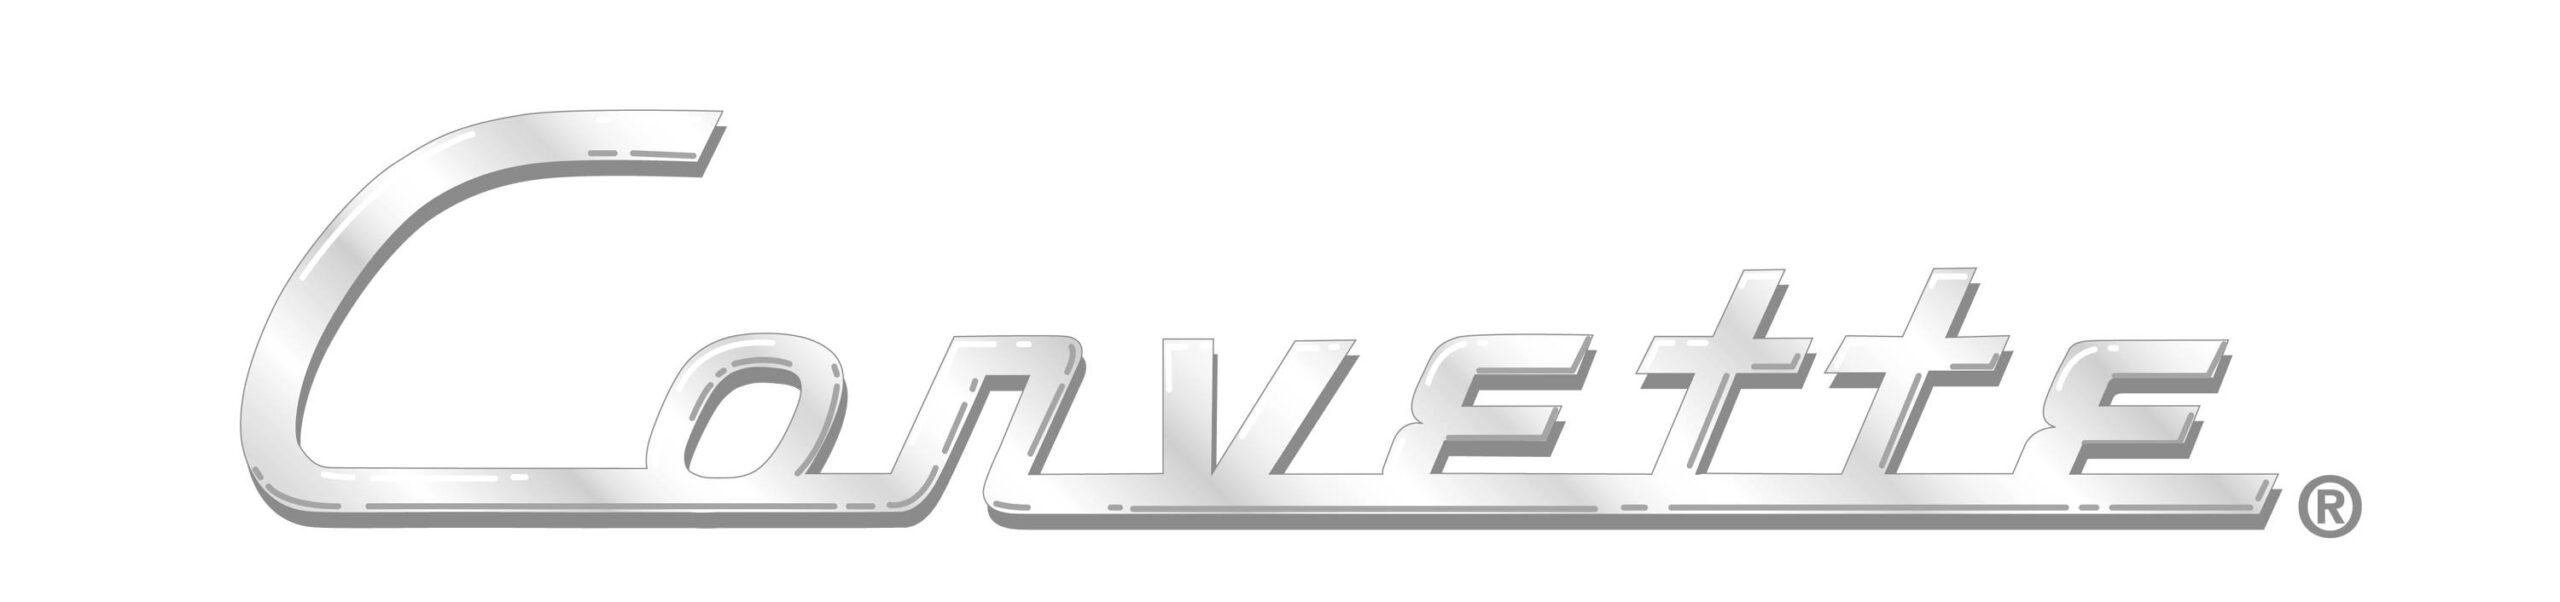 Tipografía Corvette Original